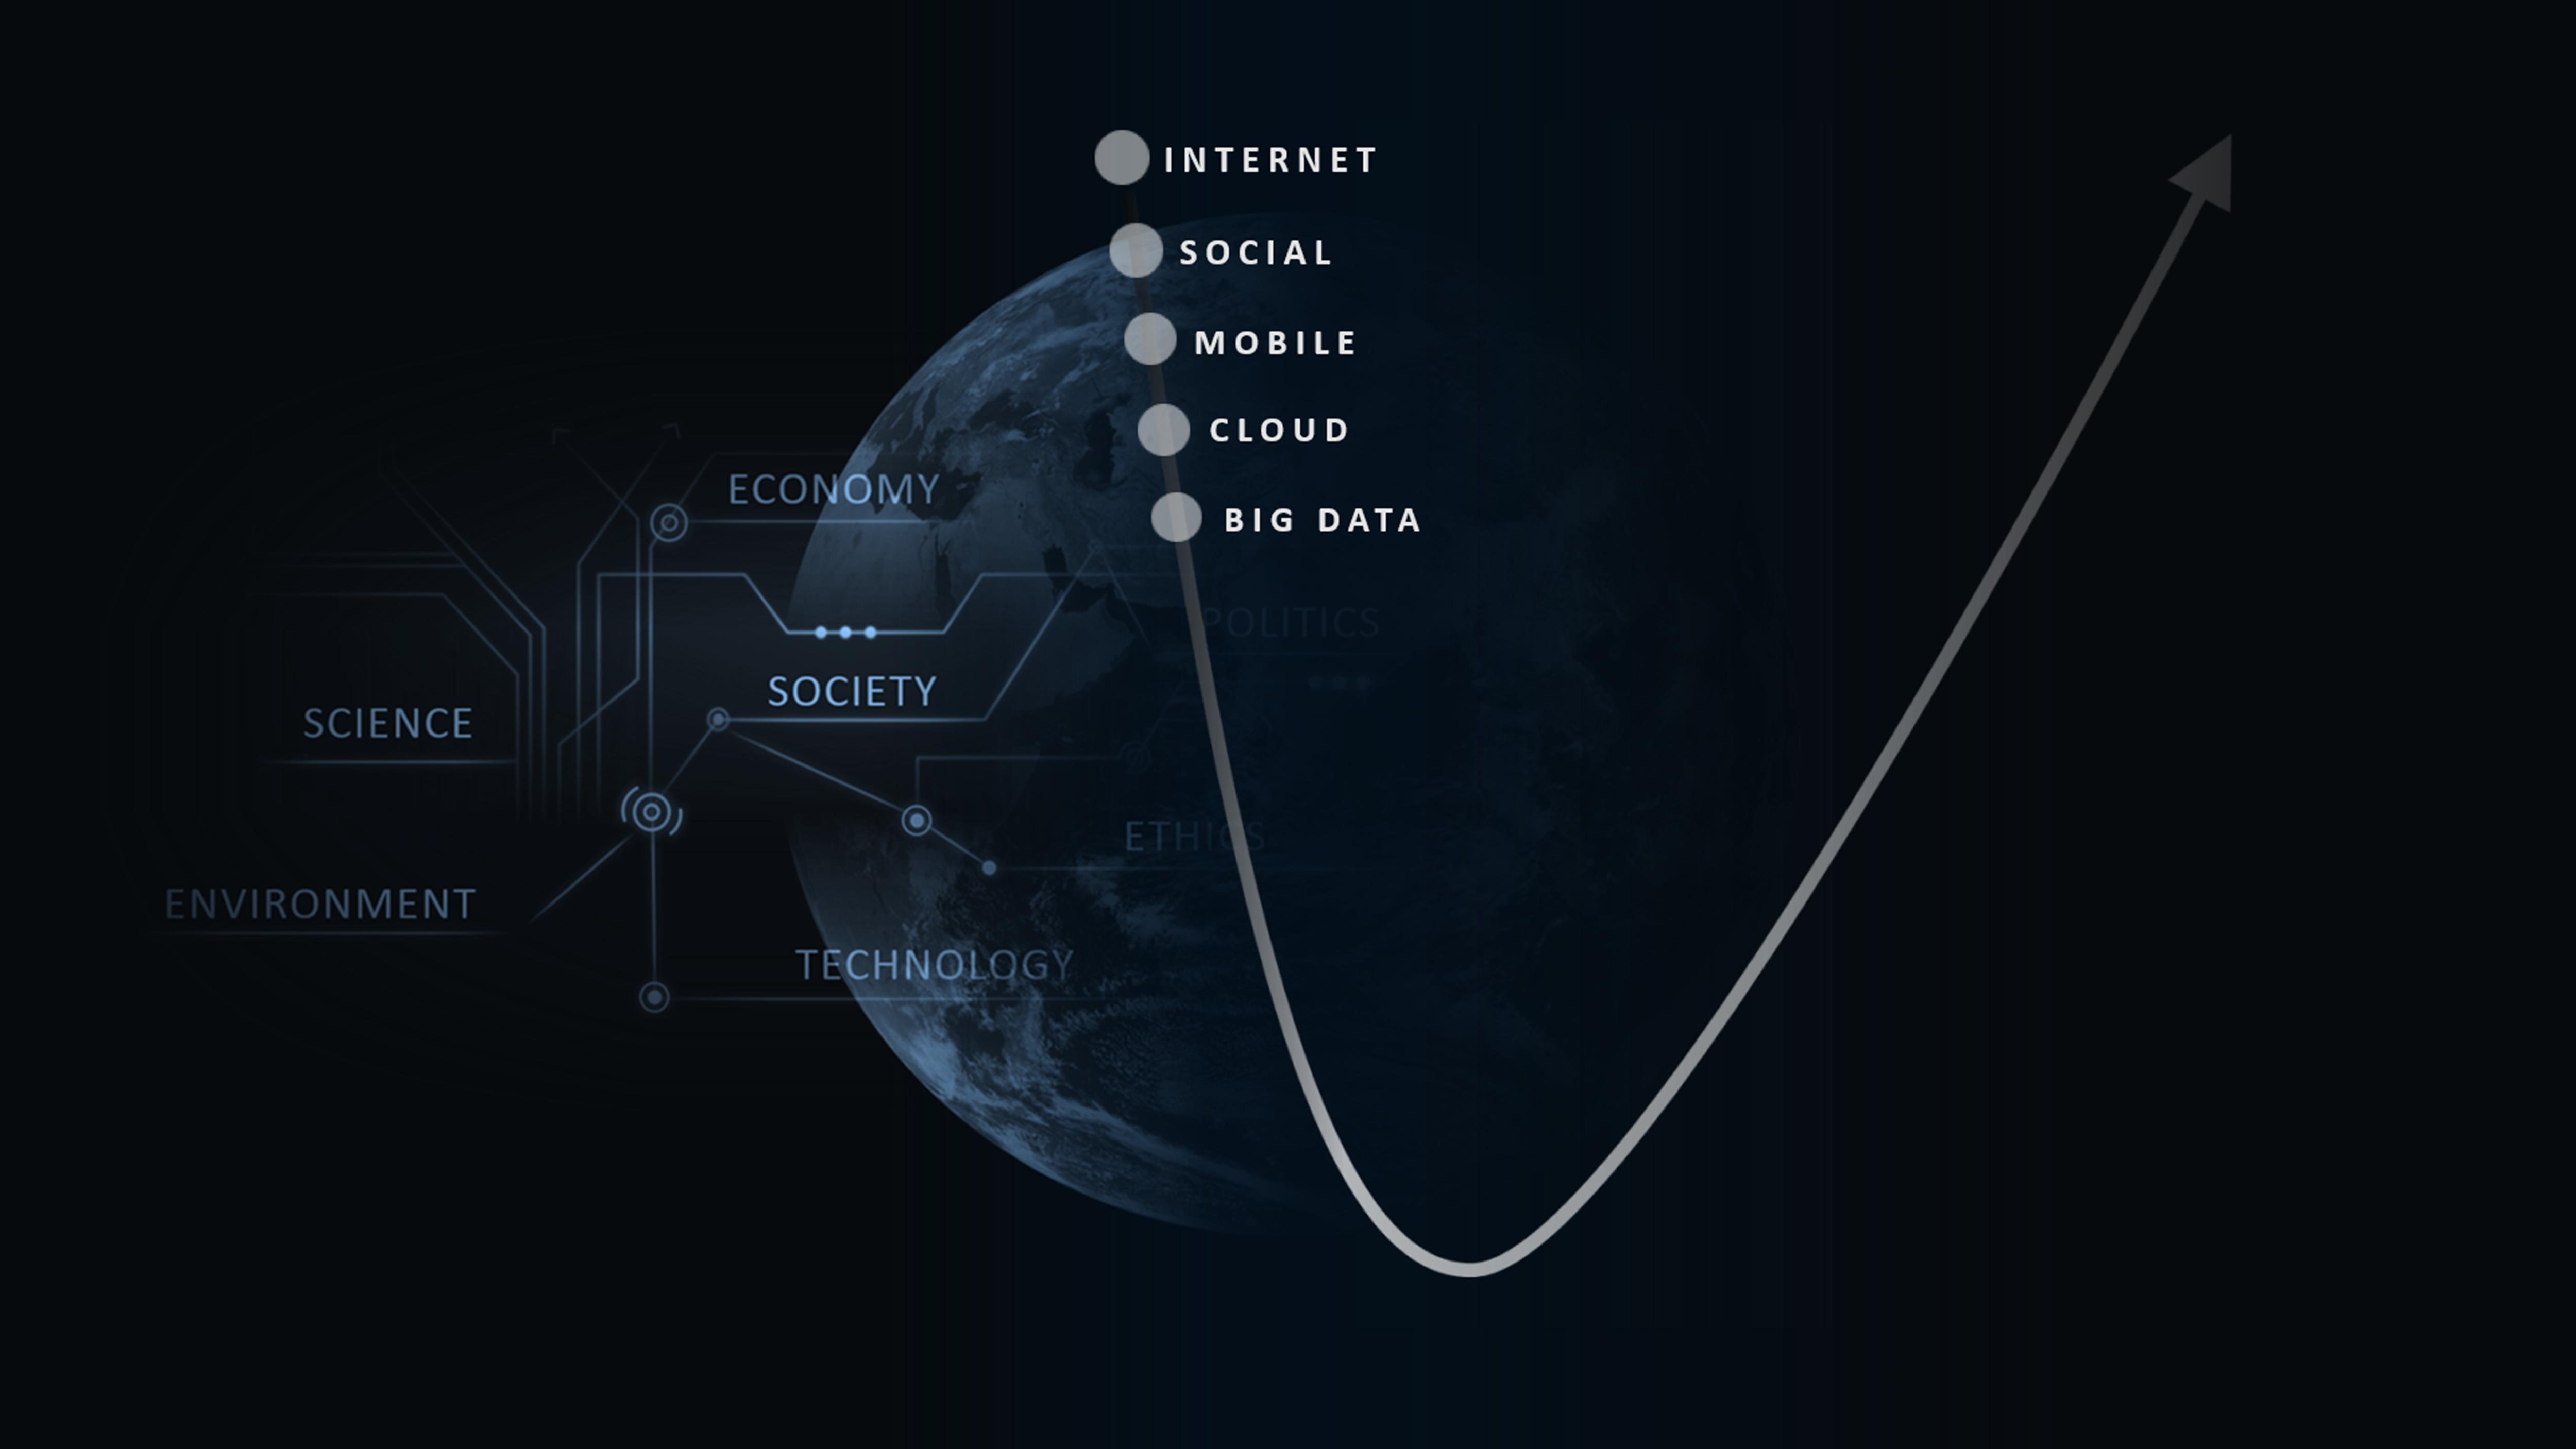 Https 2018 11 01 Techno Philanthropists Drive Description Schematic Block Diagram Examplejpg Science And Technology Curve Digital Foundation